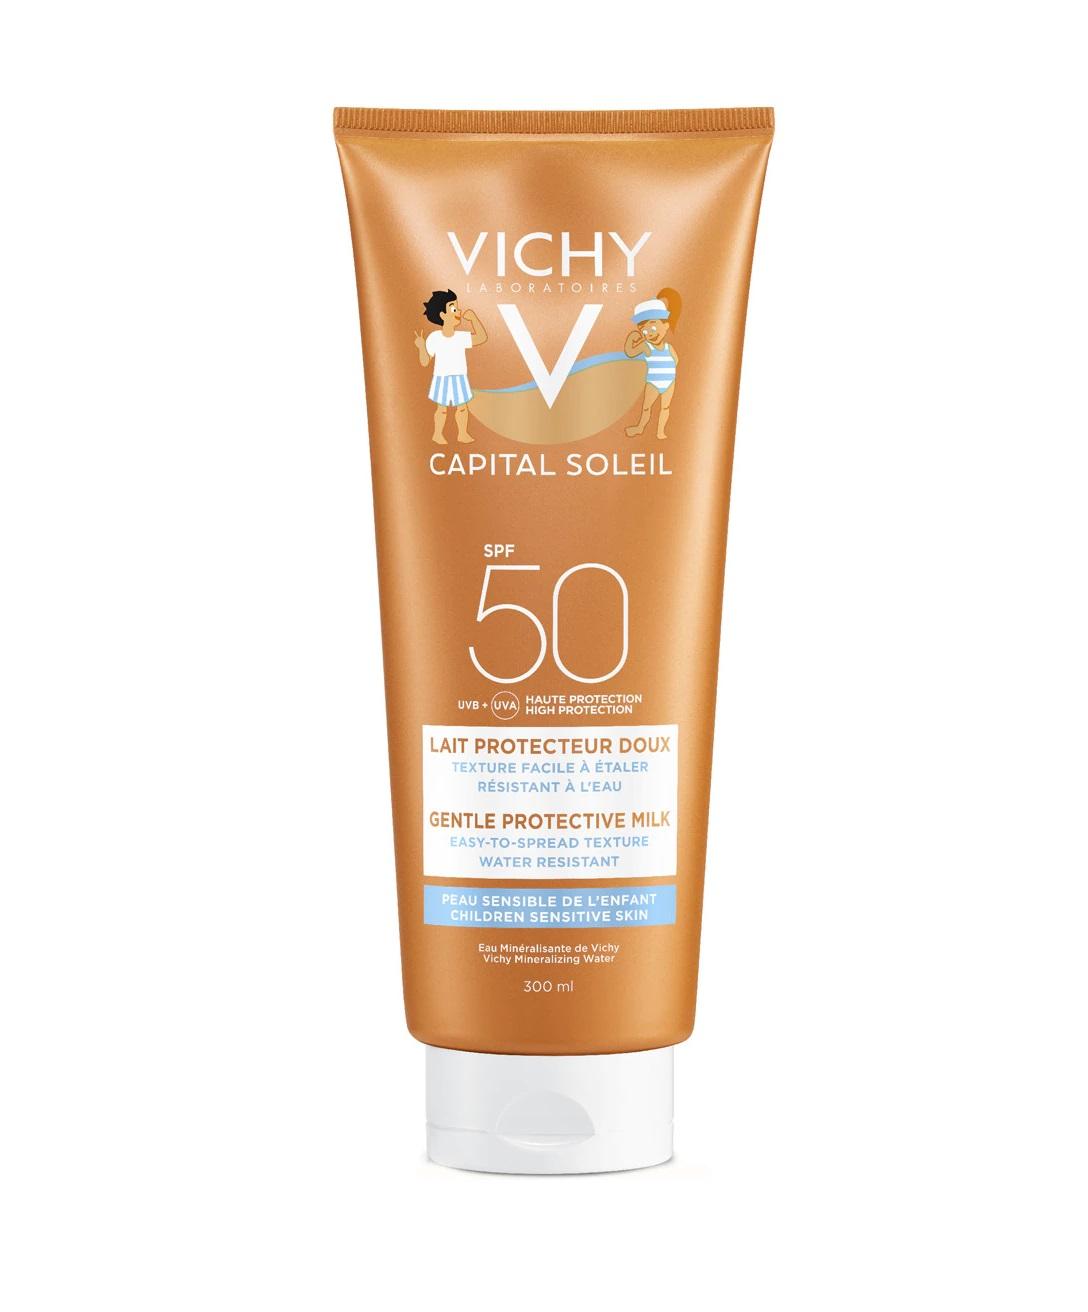 Leche con protección solar SPF50 para piel sensible infantil de Vichy